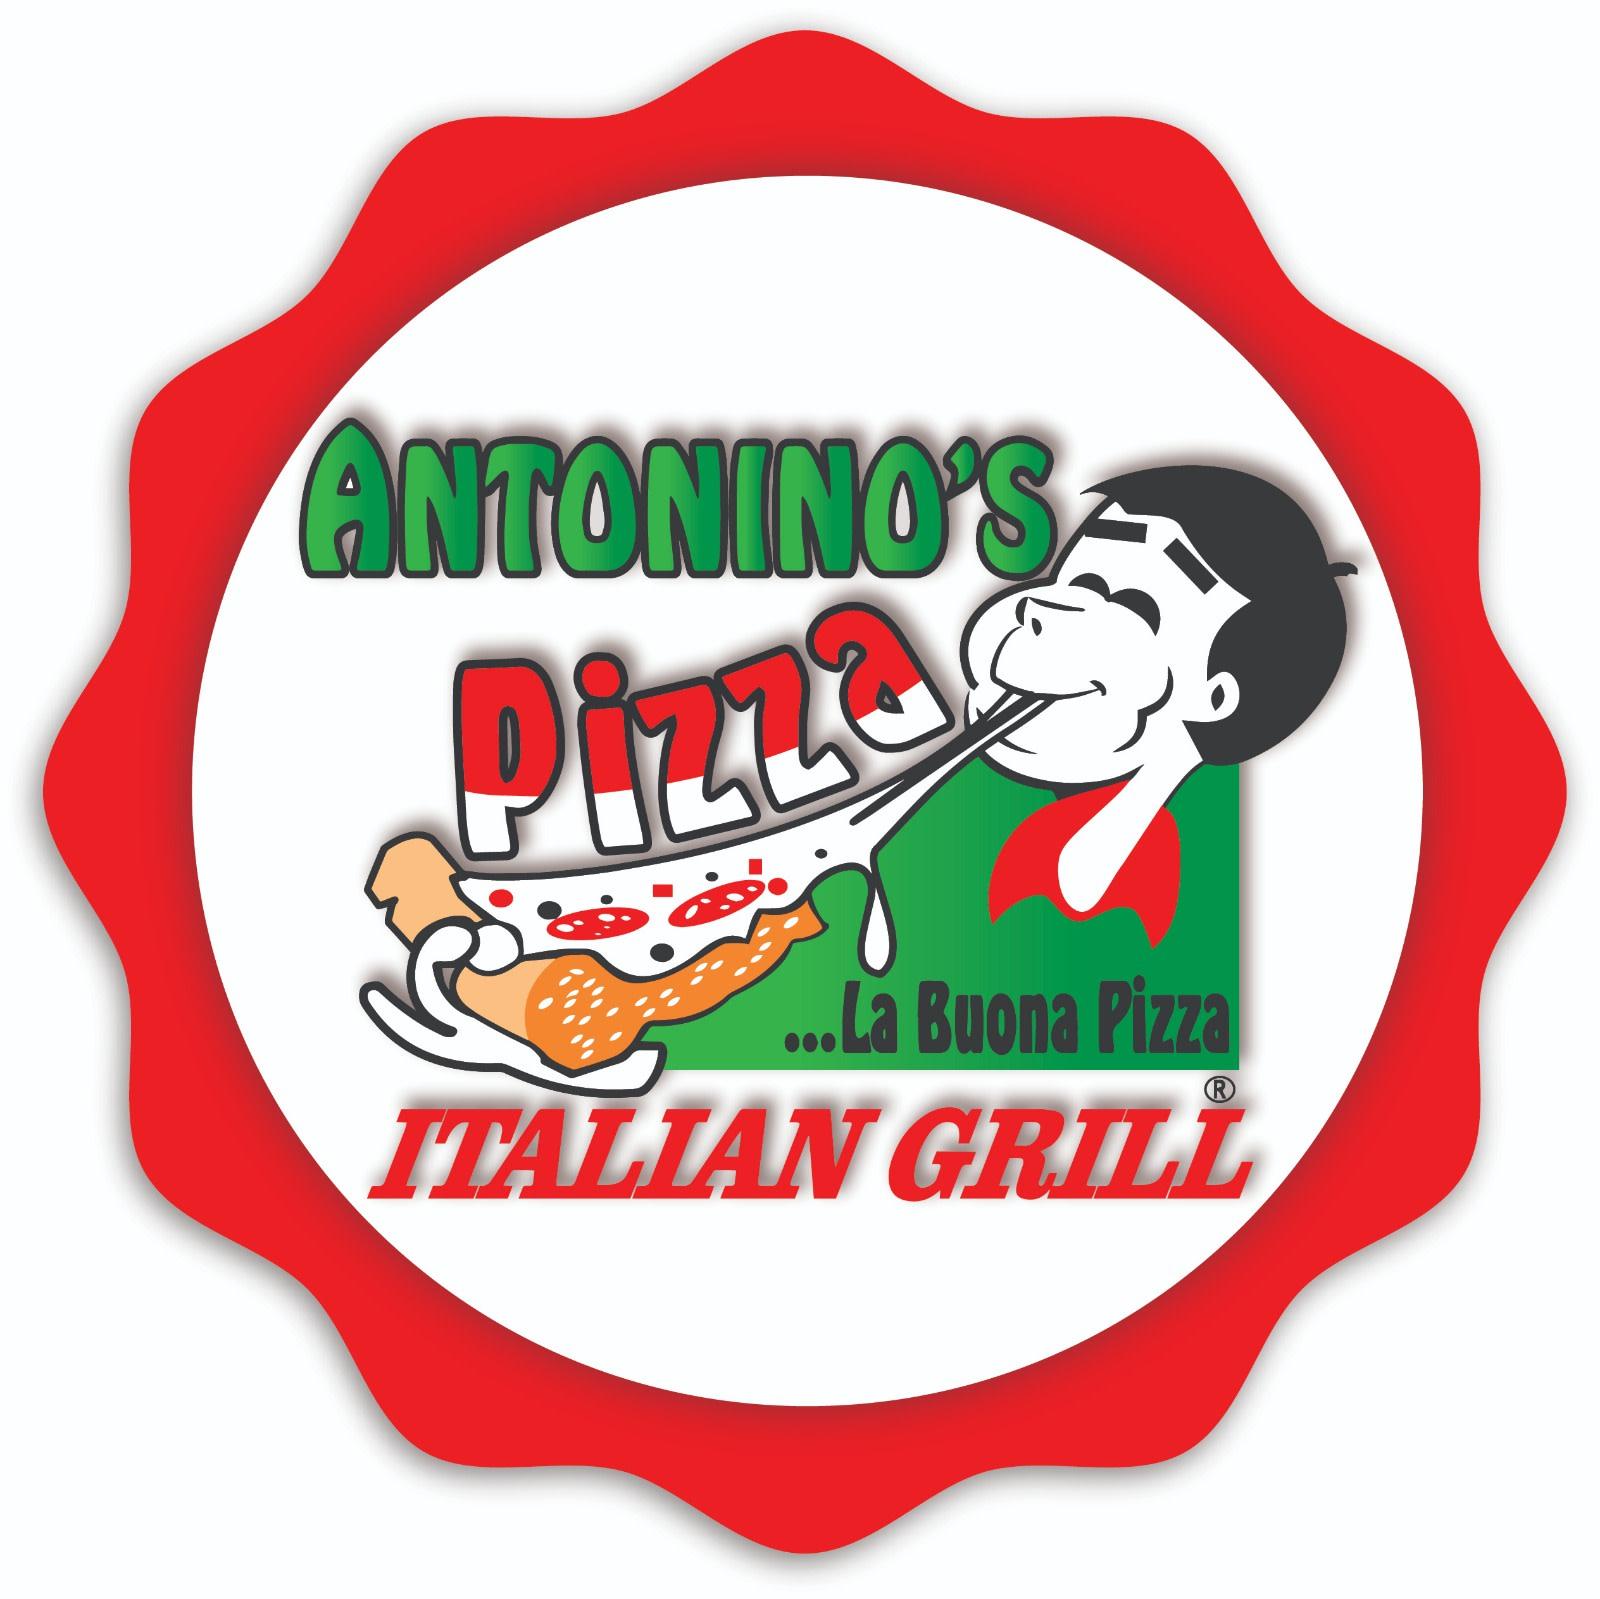 2 Medianas Pepperoni-Jamon o Chorizo -:Palitos Regulares   Soda 1.75lt